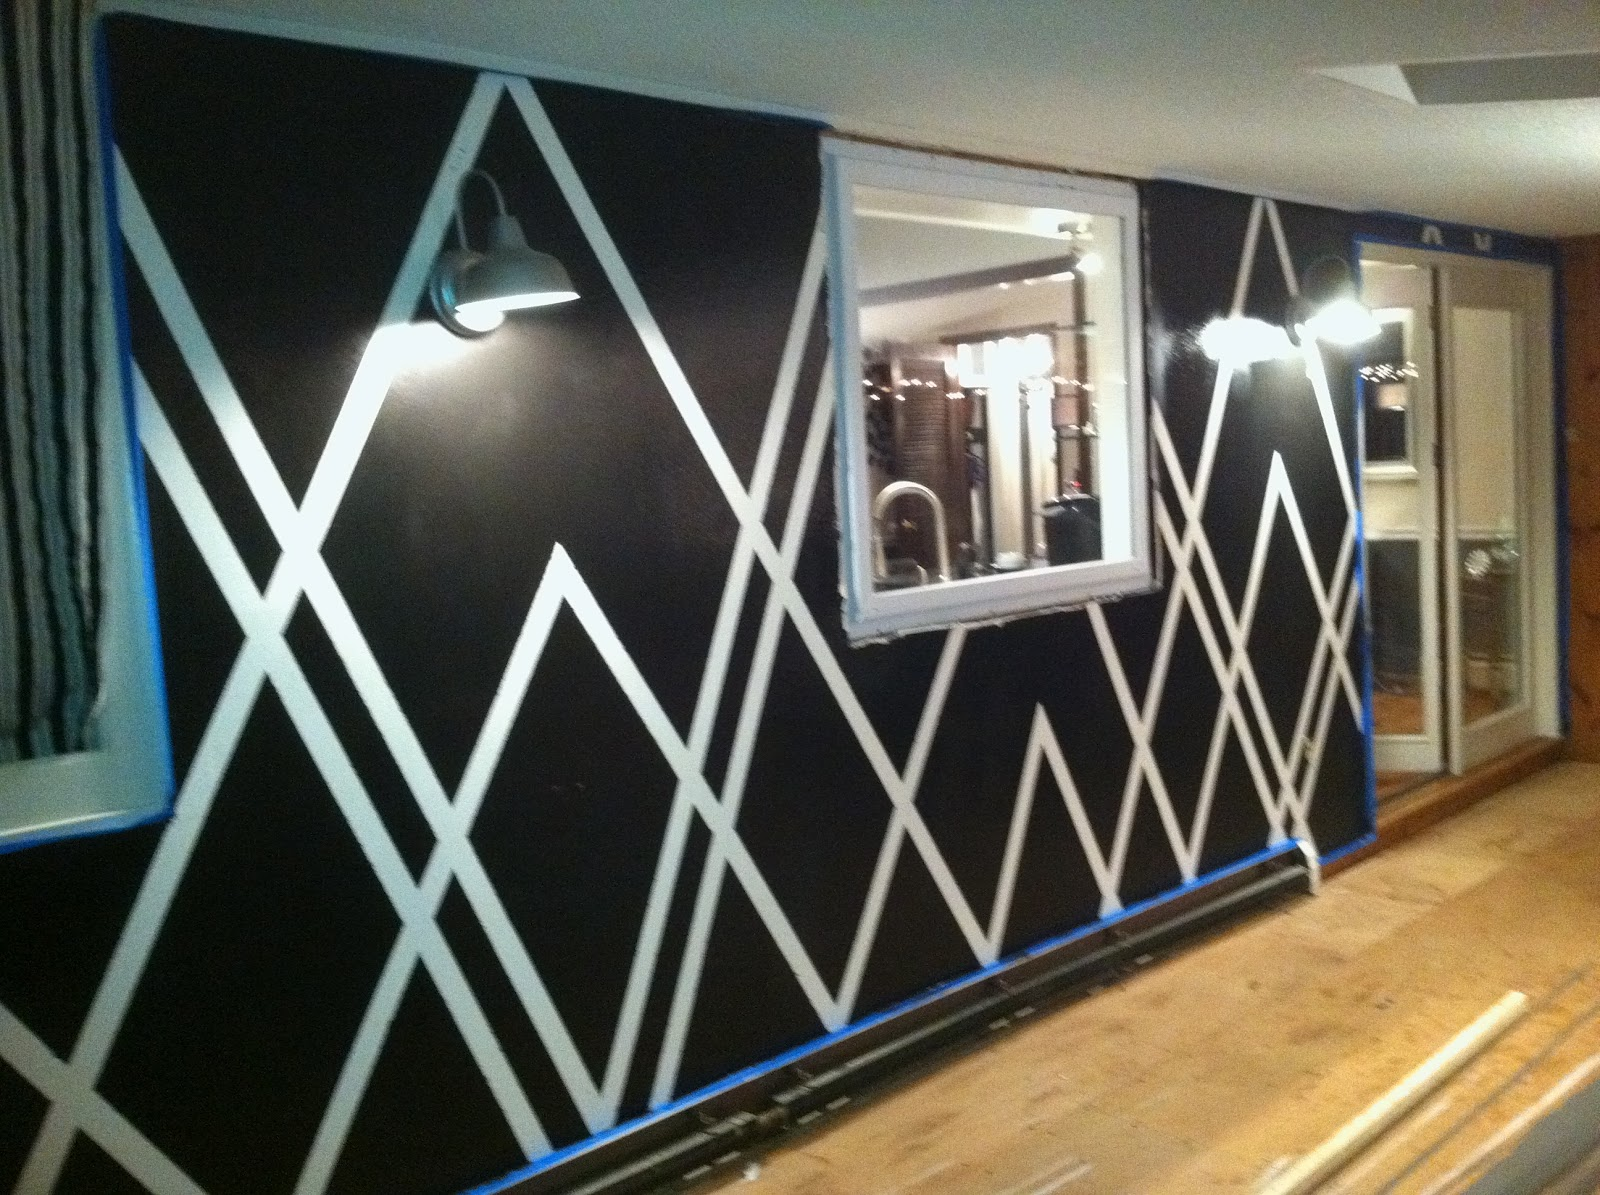 decor4poor painters tape design wall. Black Bedroom Furniture Sets. Home Design Ideas